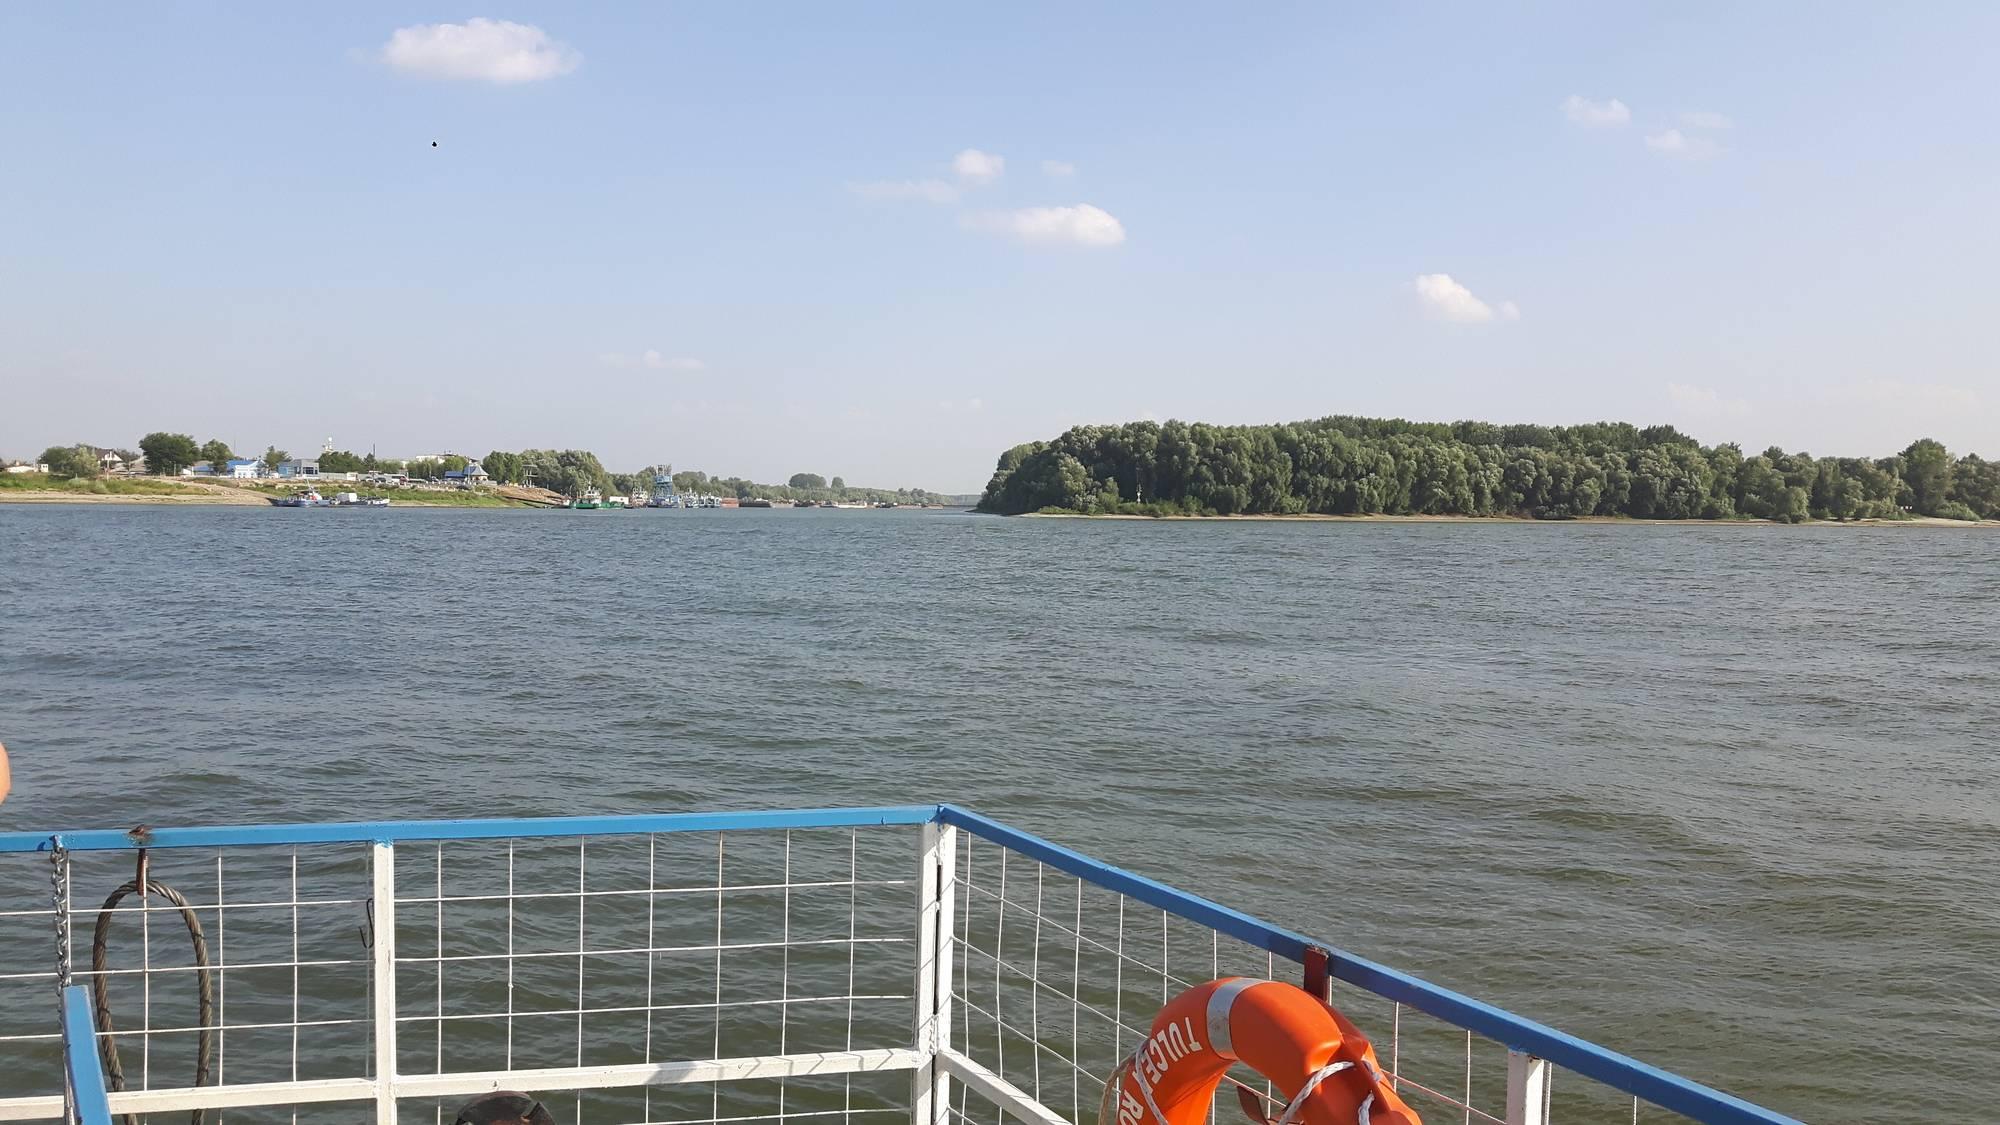 Traversee-Danube-bac_07-09-2018_03